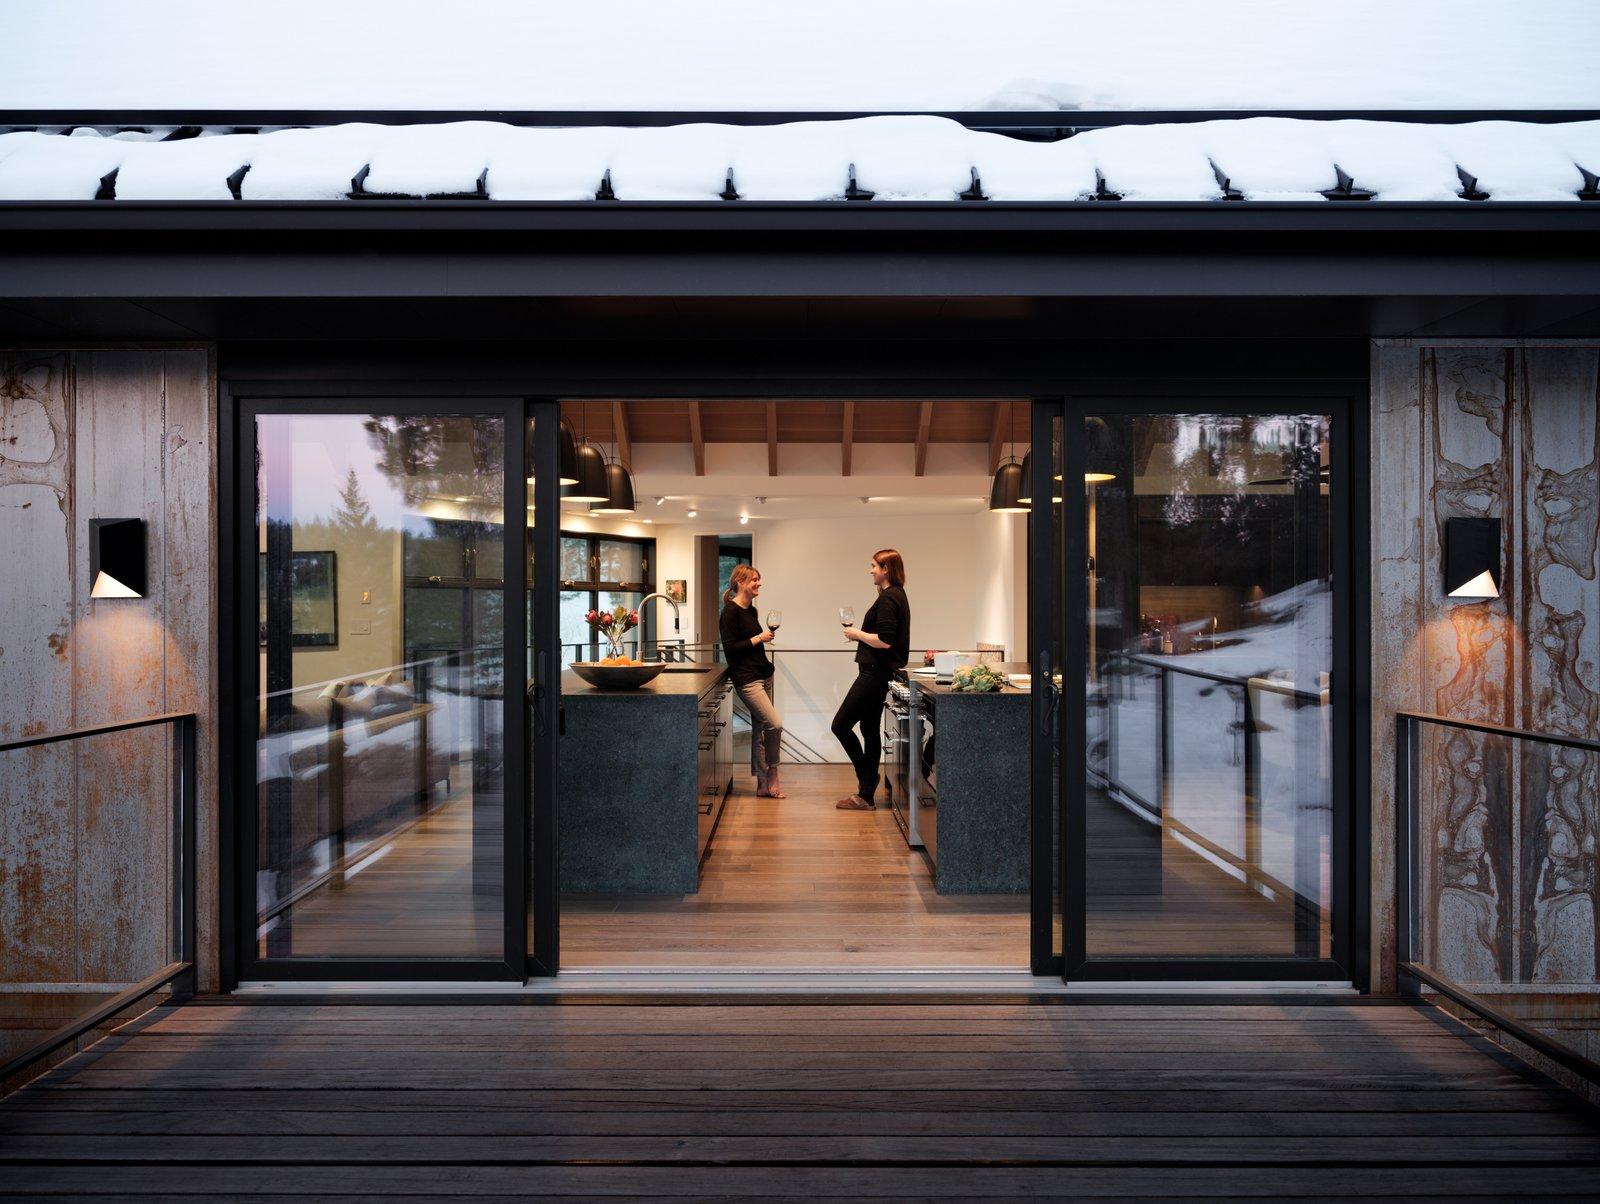 Kitchen, Dishwasher, Dark Hardwood Floor, Cooktops, Wood Cabinet, Undermount Sink, and Pendant Lighting  Modern Cabin by HMHAI